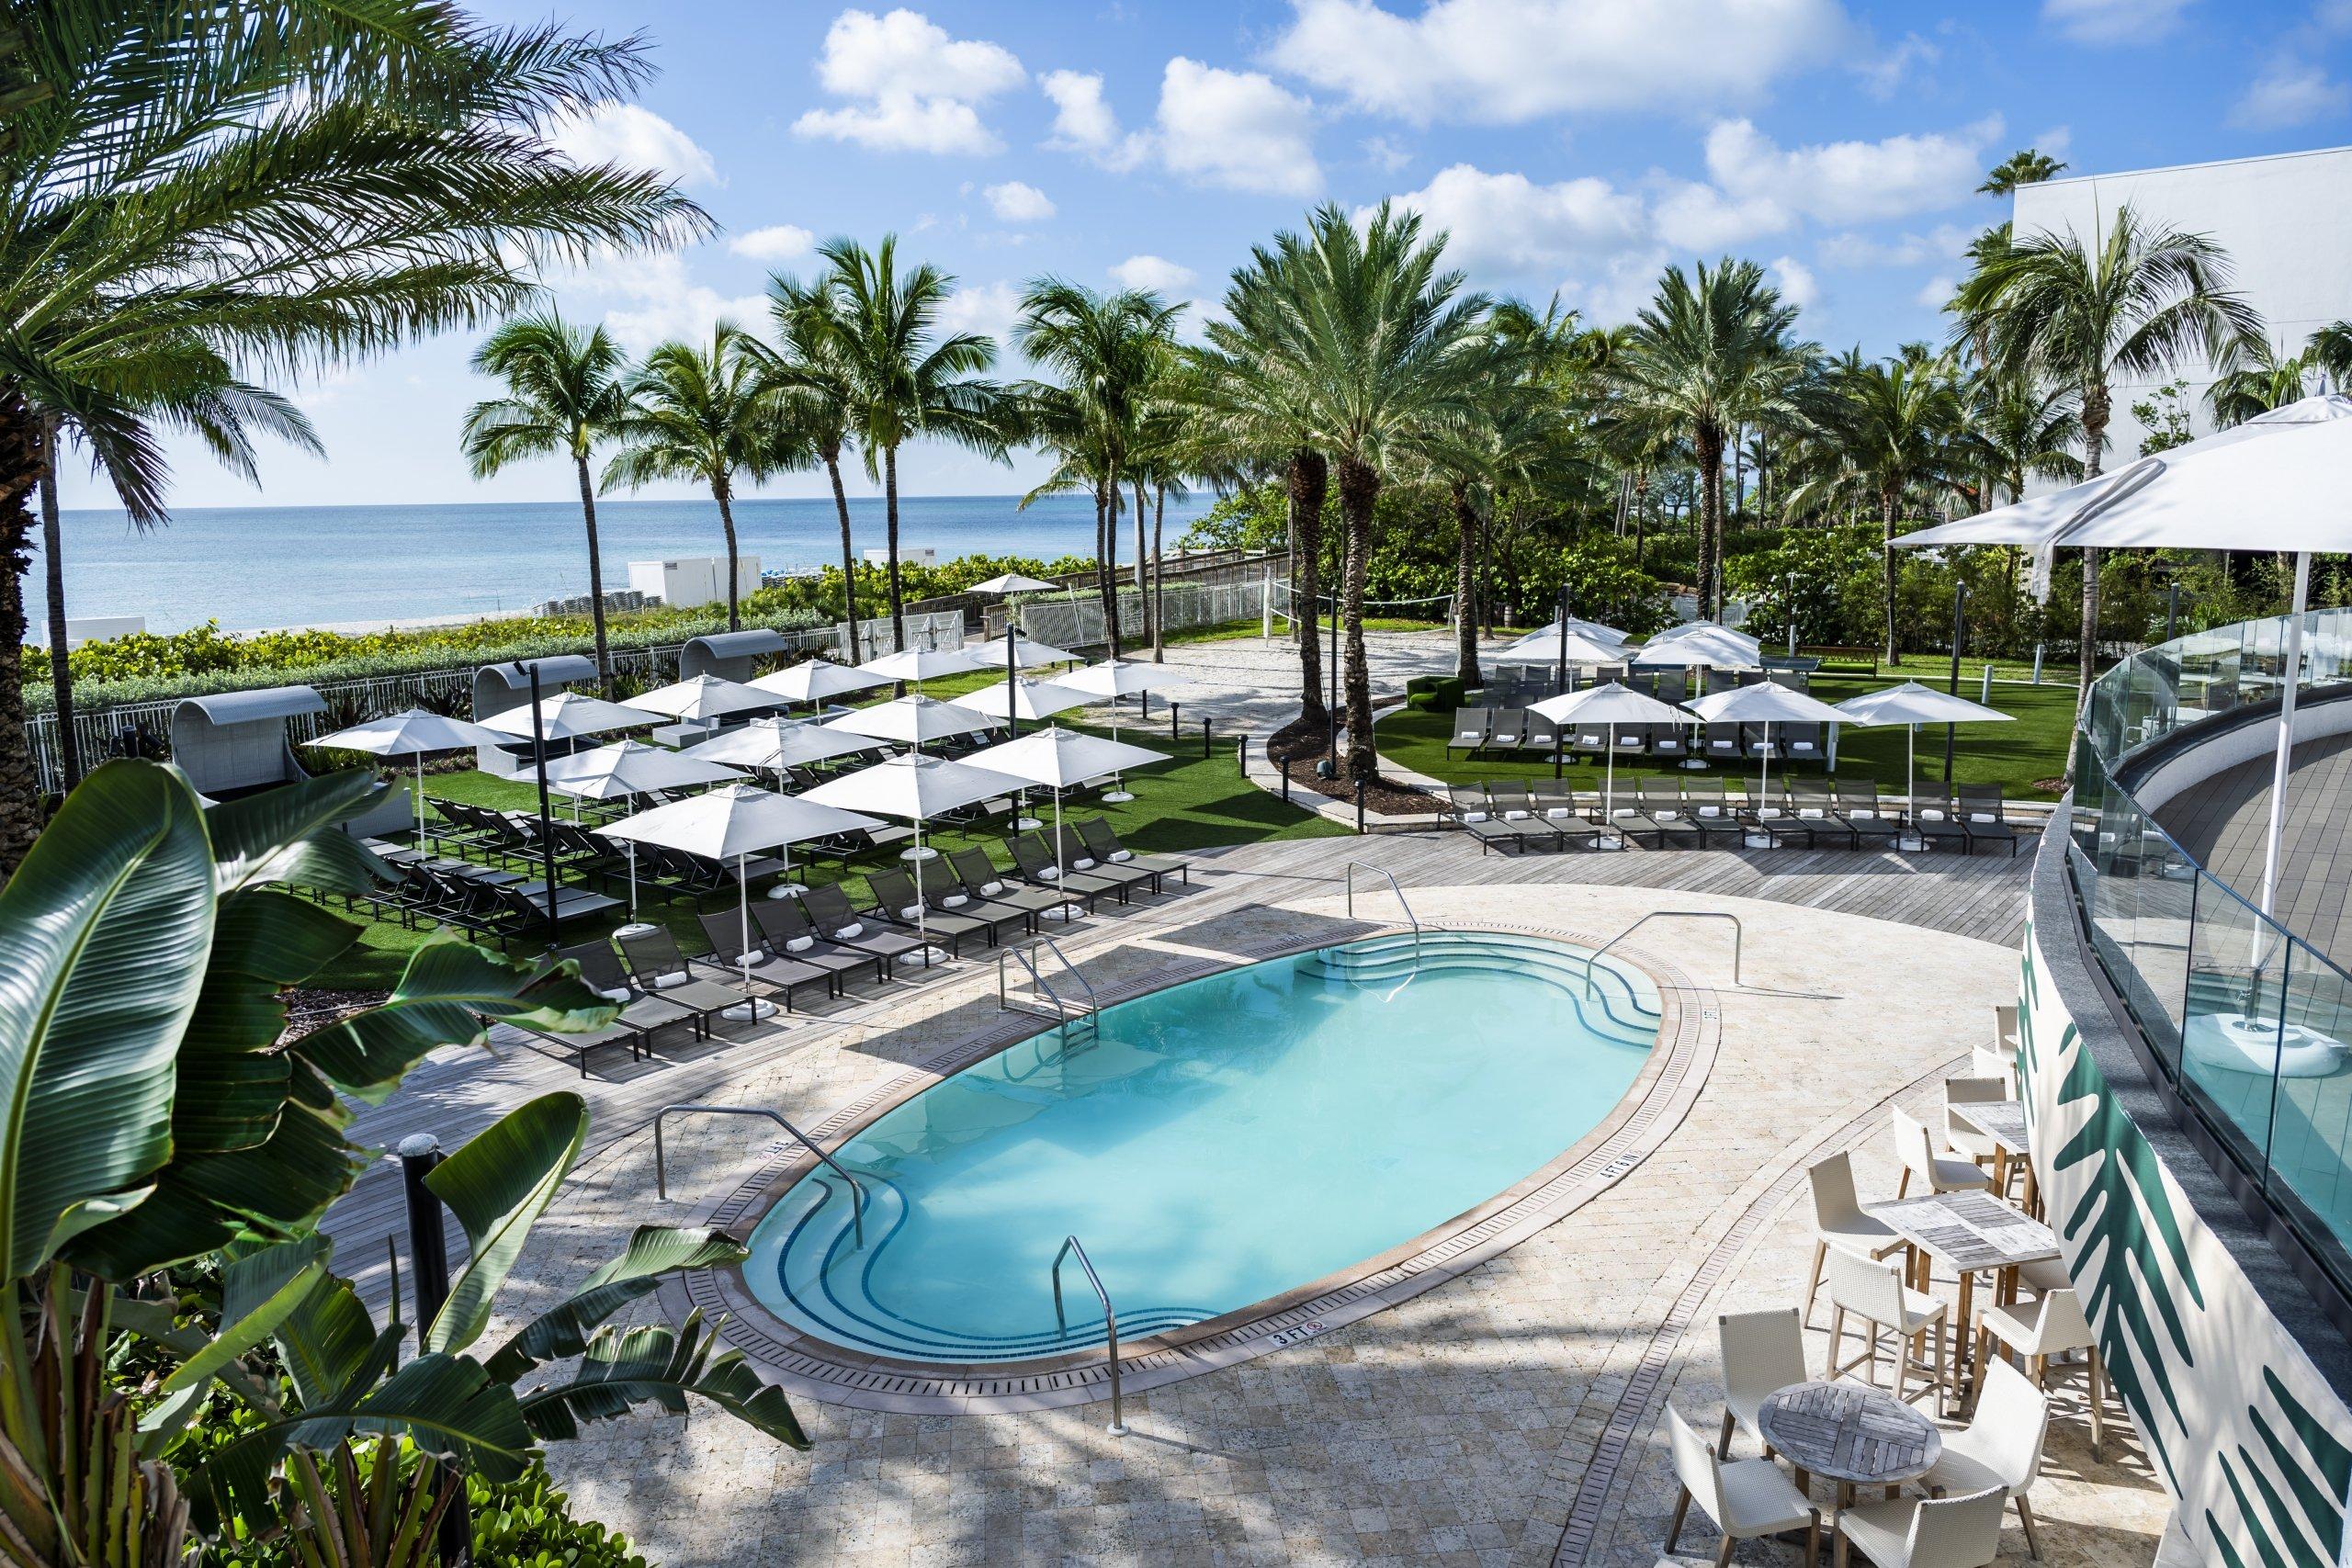 Pool at Eden Roc, Miami Beach